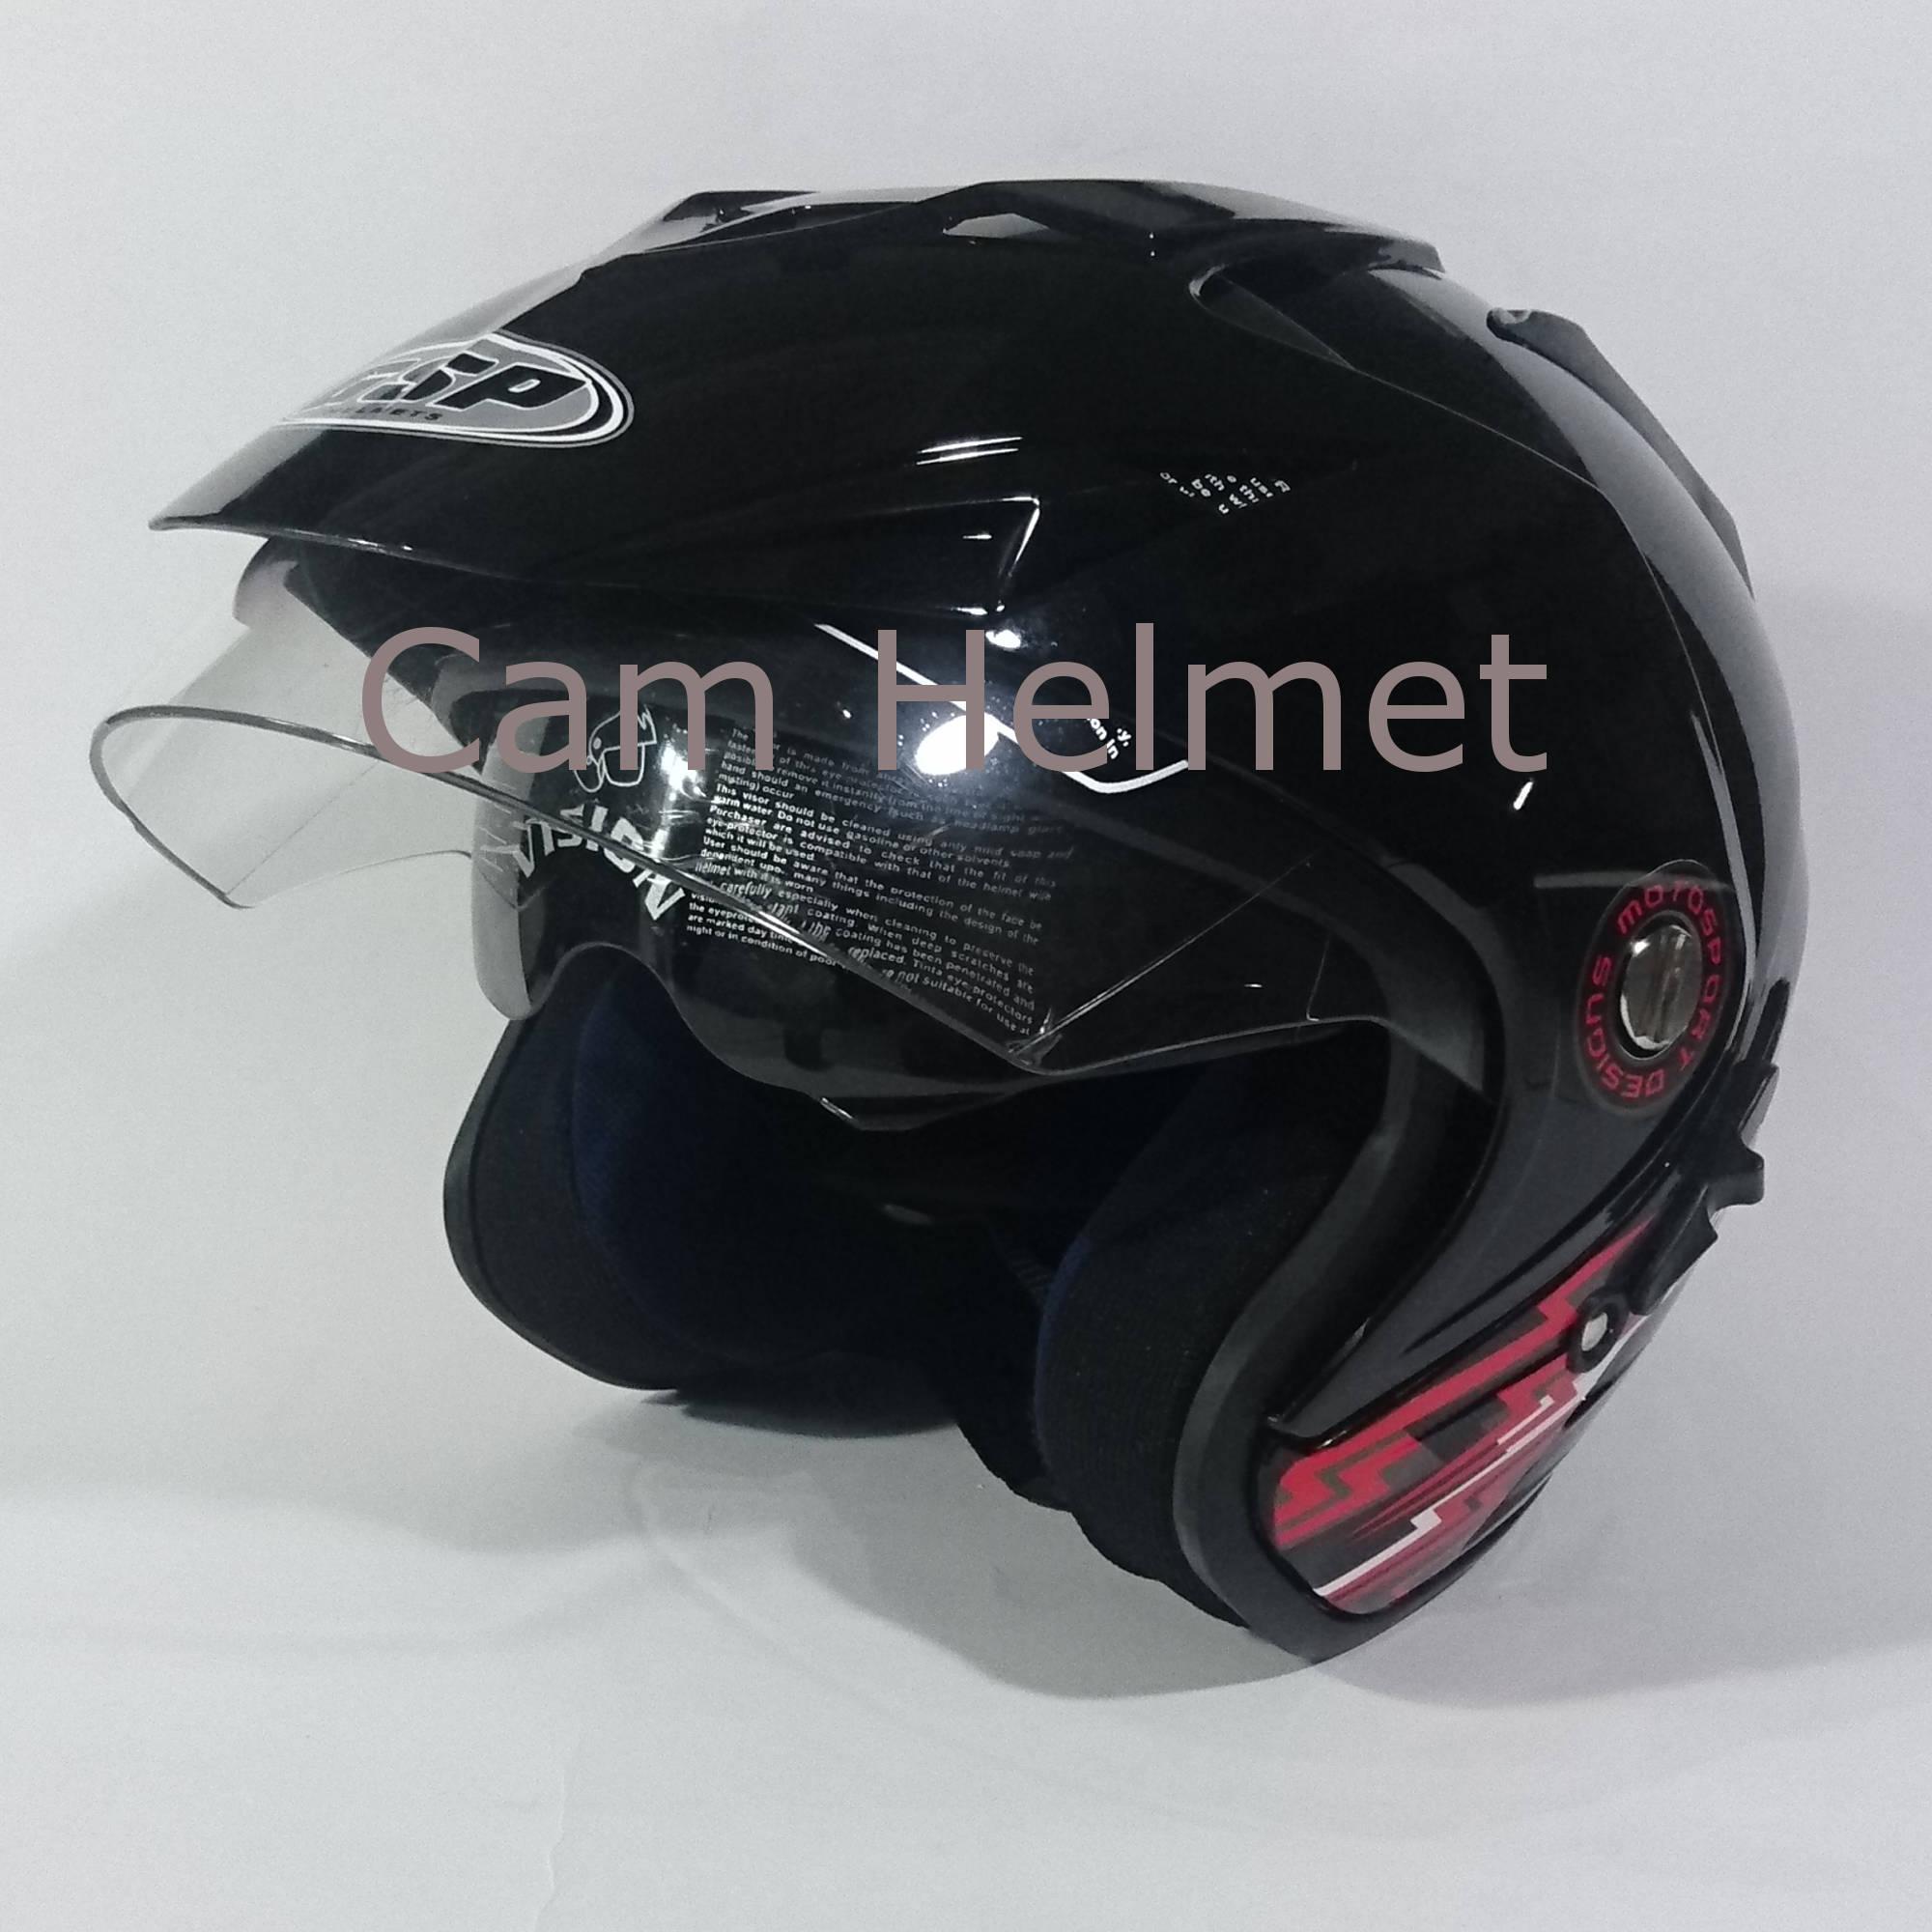 Helm Berkendara Motor Soeok Anak Unyu Model Retro Karakter Kuda Pony Pink Merah Gsp Jp 8 Black Gloss 2 Kaca Double Visor